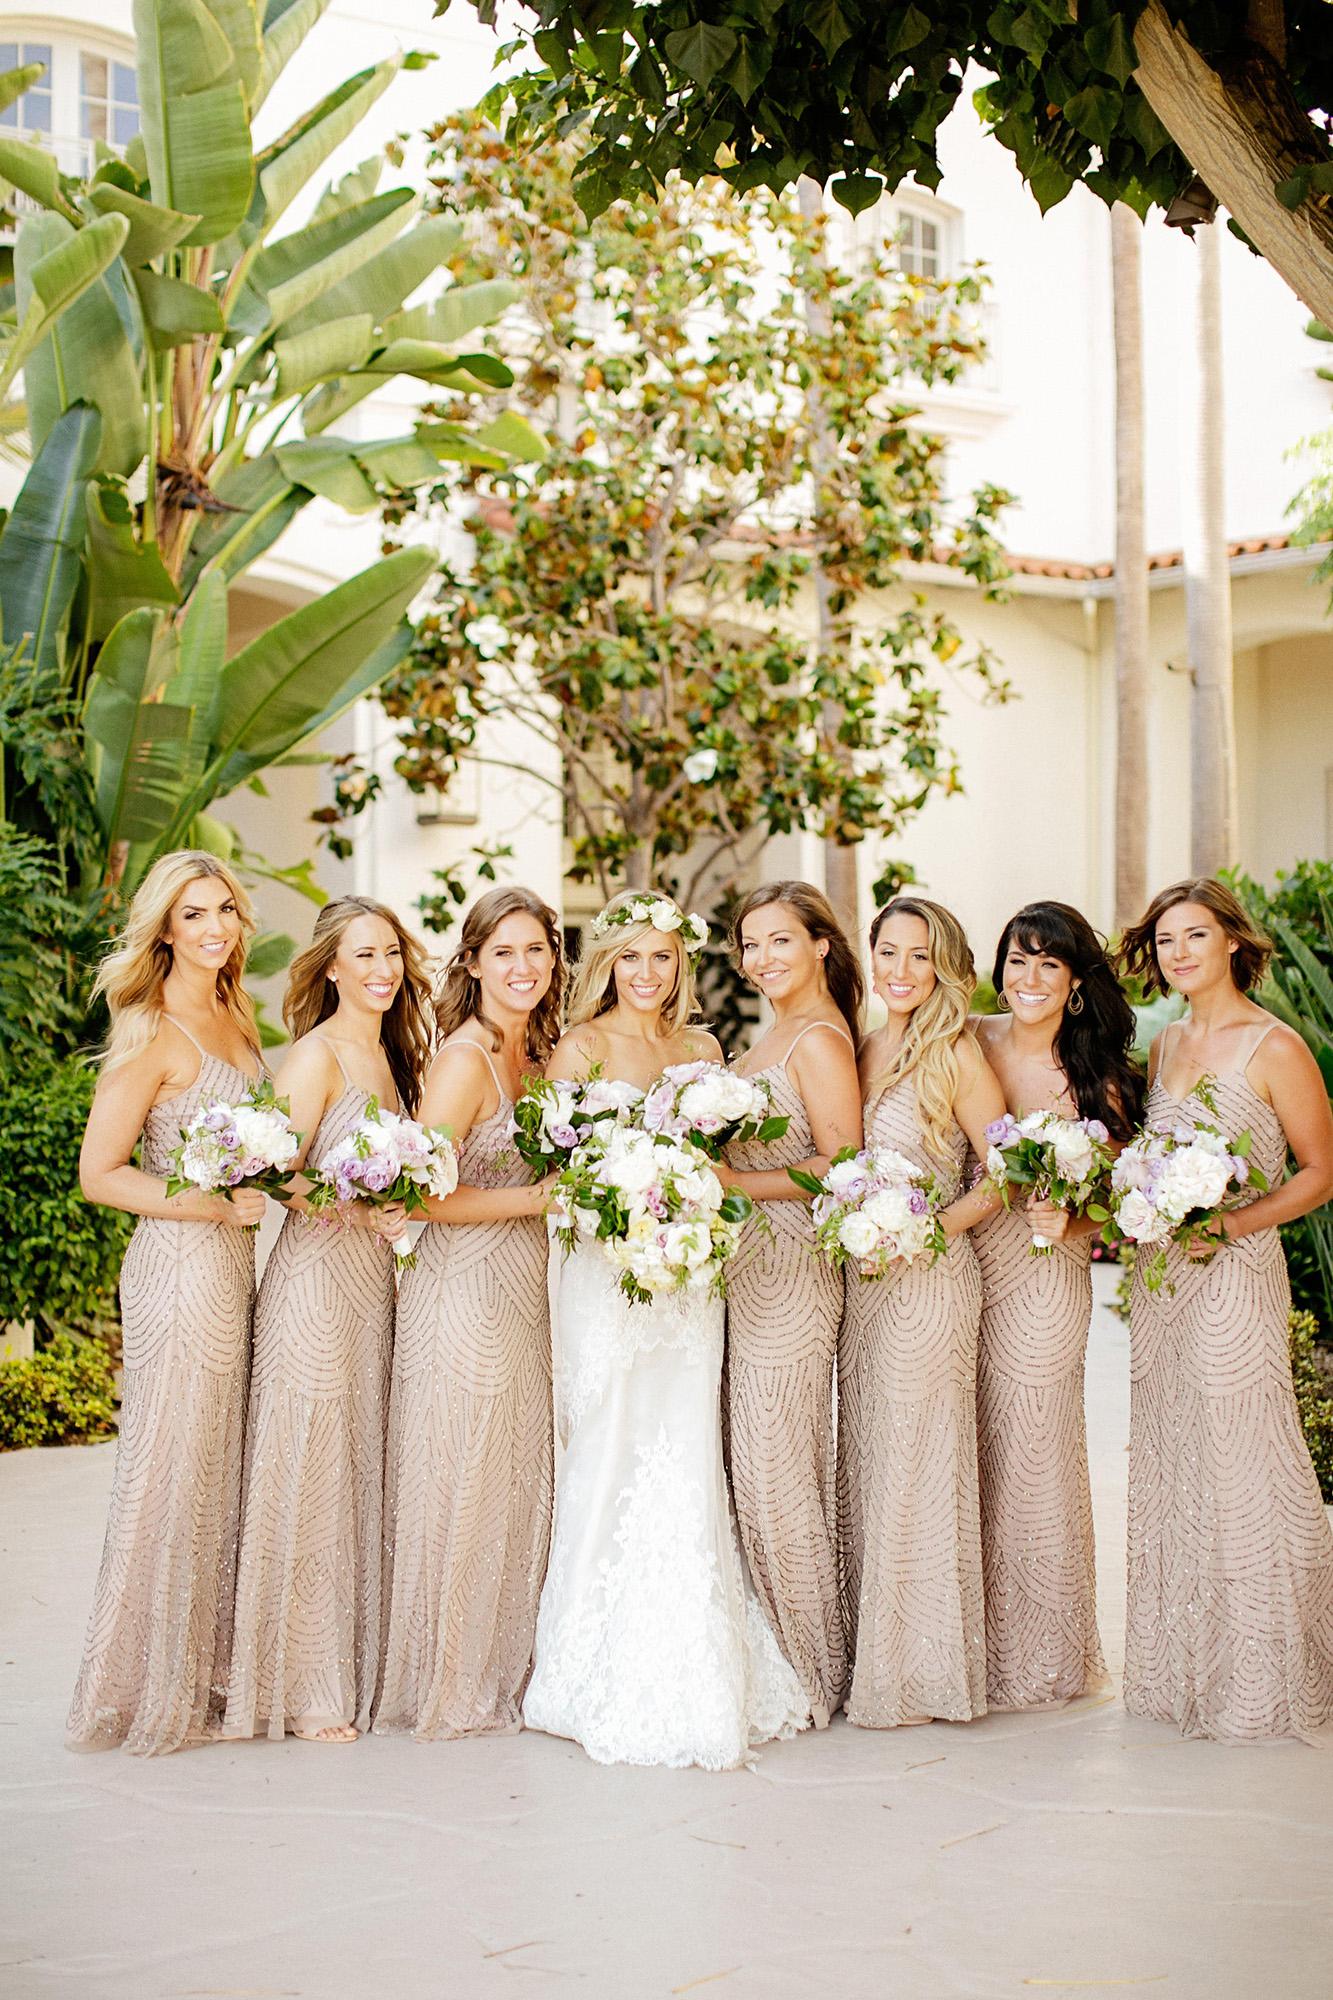 Rent the Runway Bride and Bridesmaids